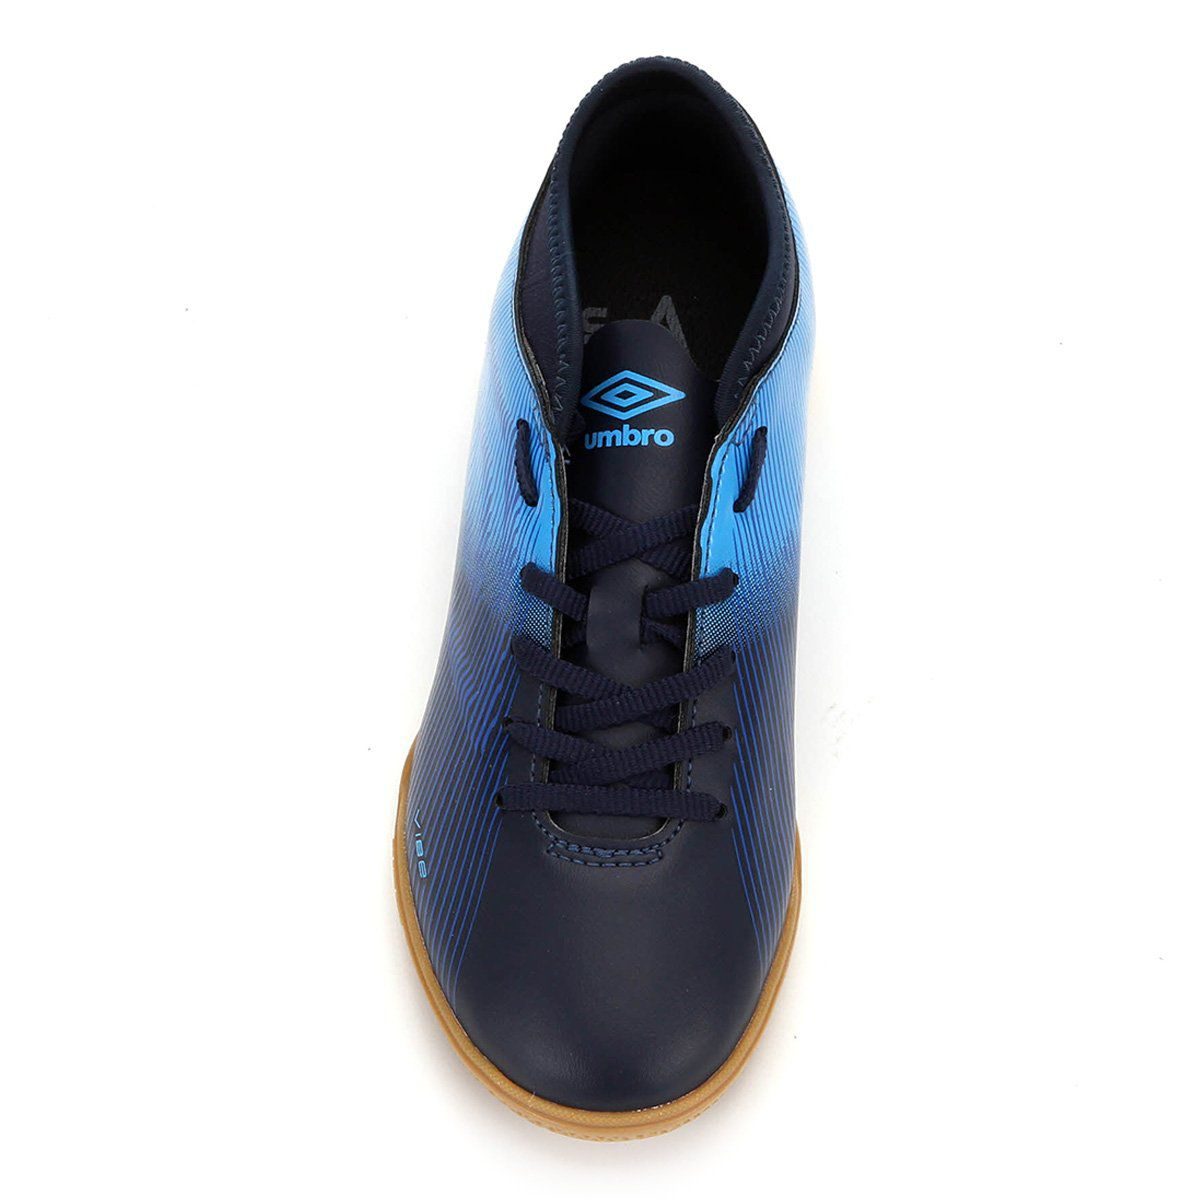 Chuteira Umbro Futsal Vibe II Jr - Juvenil- Azul/Preto